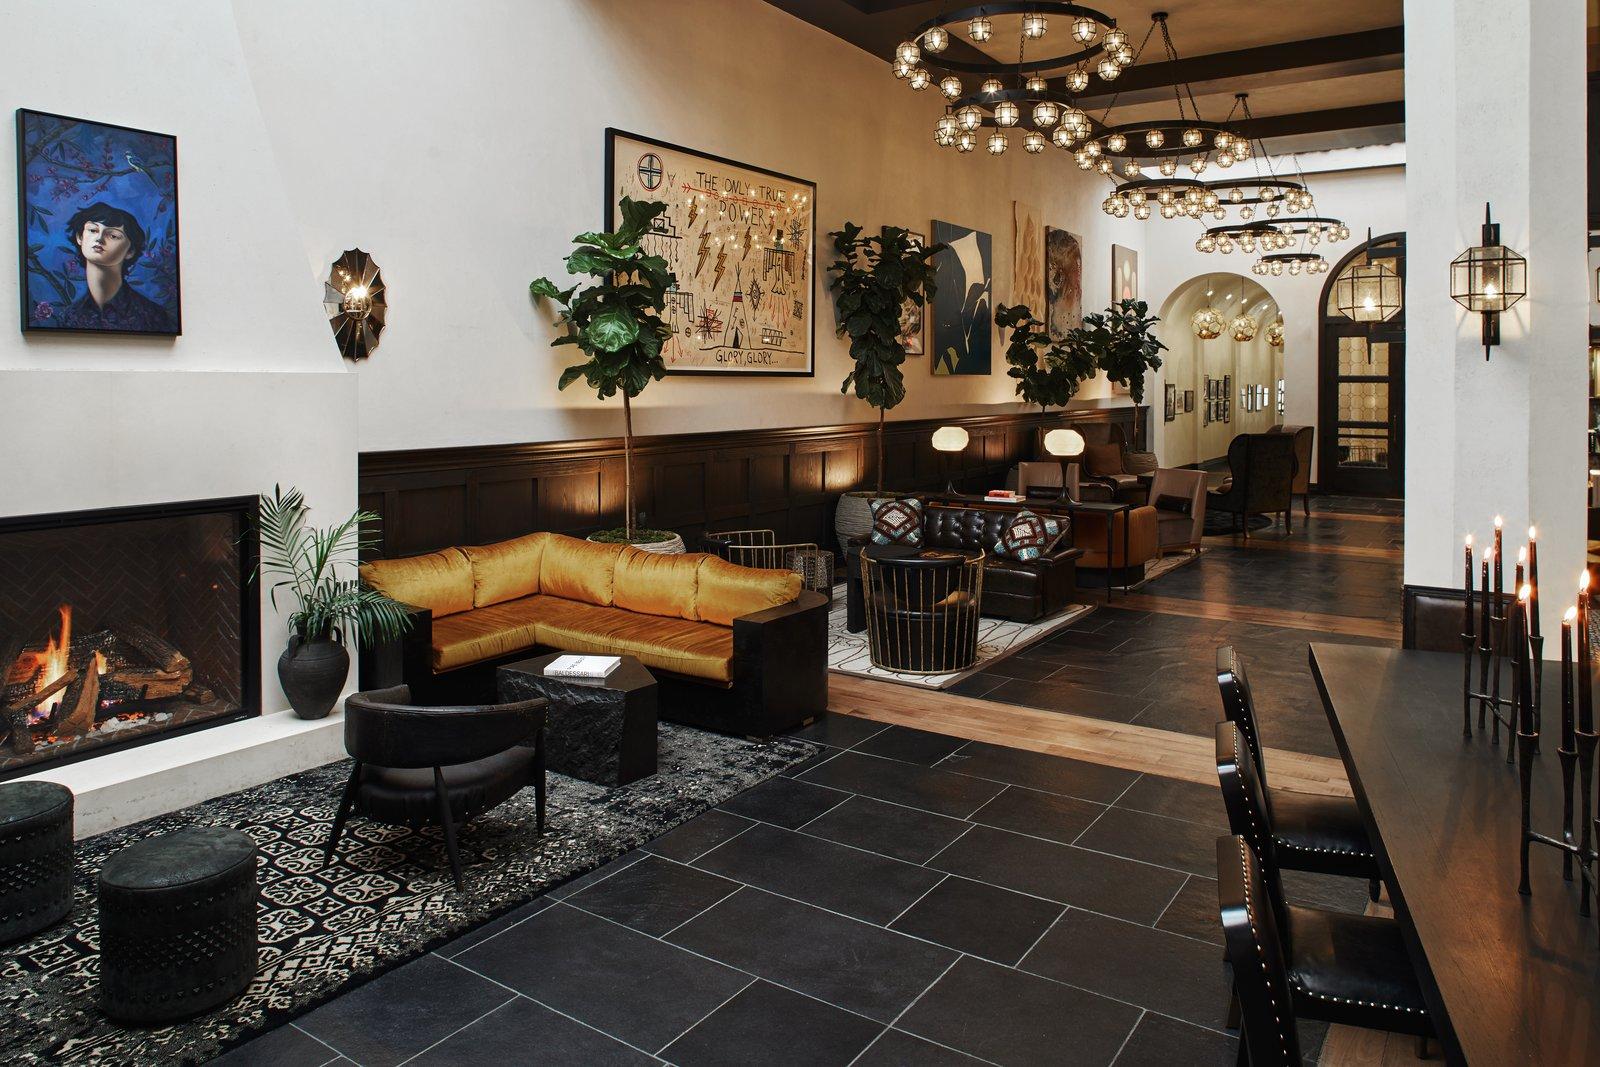 Hotel Figueroa lobby